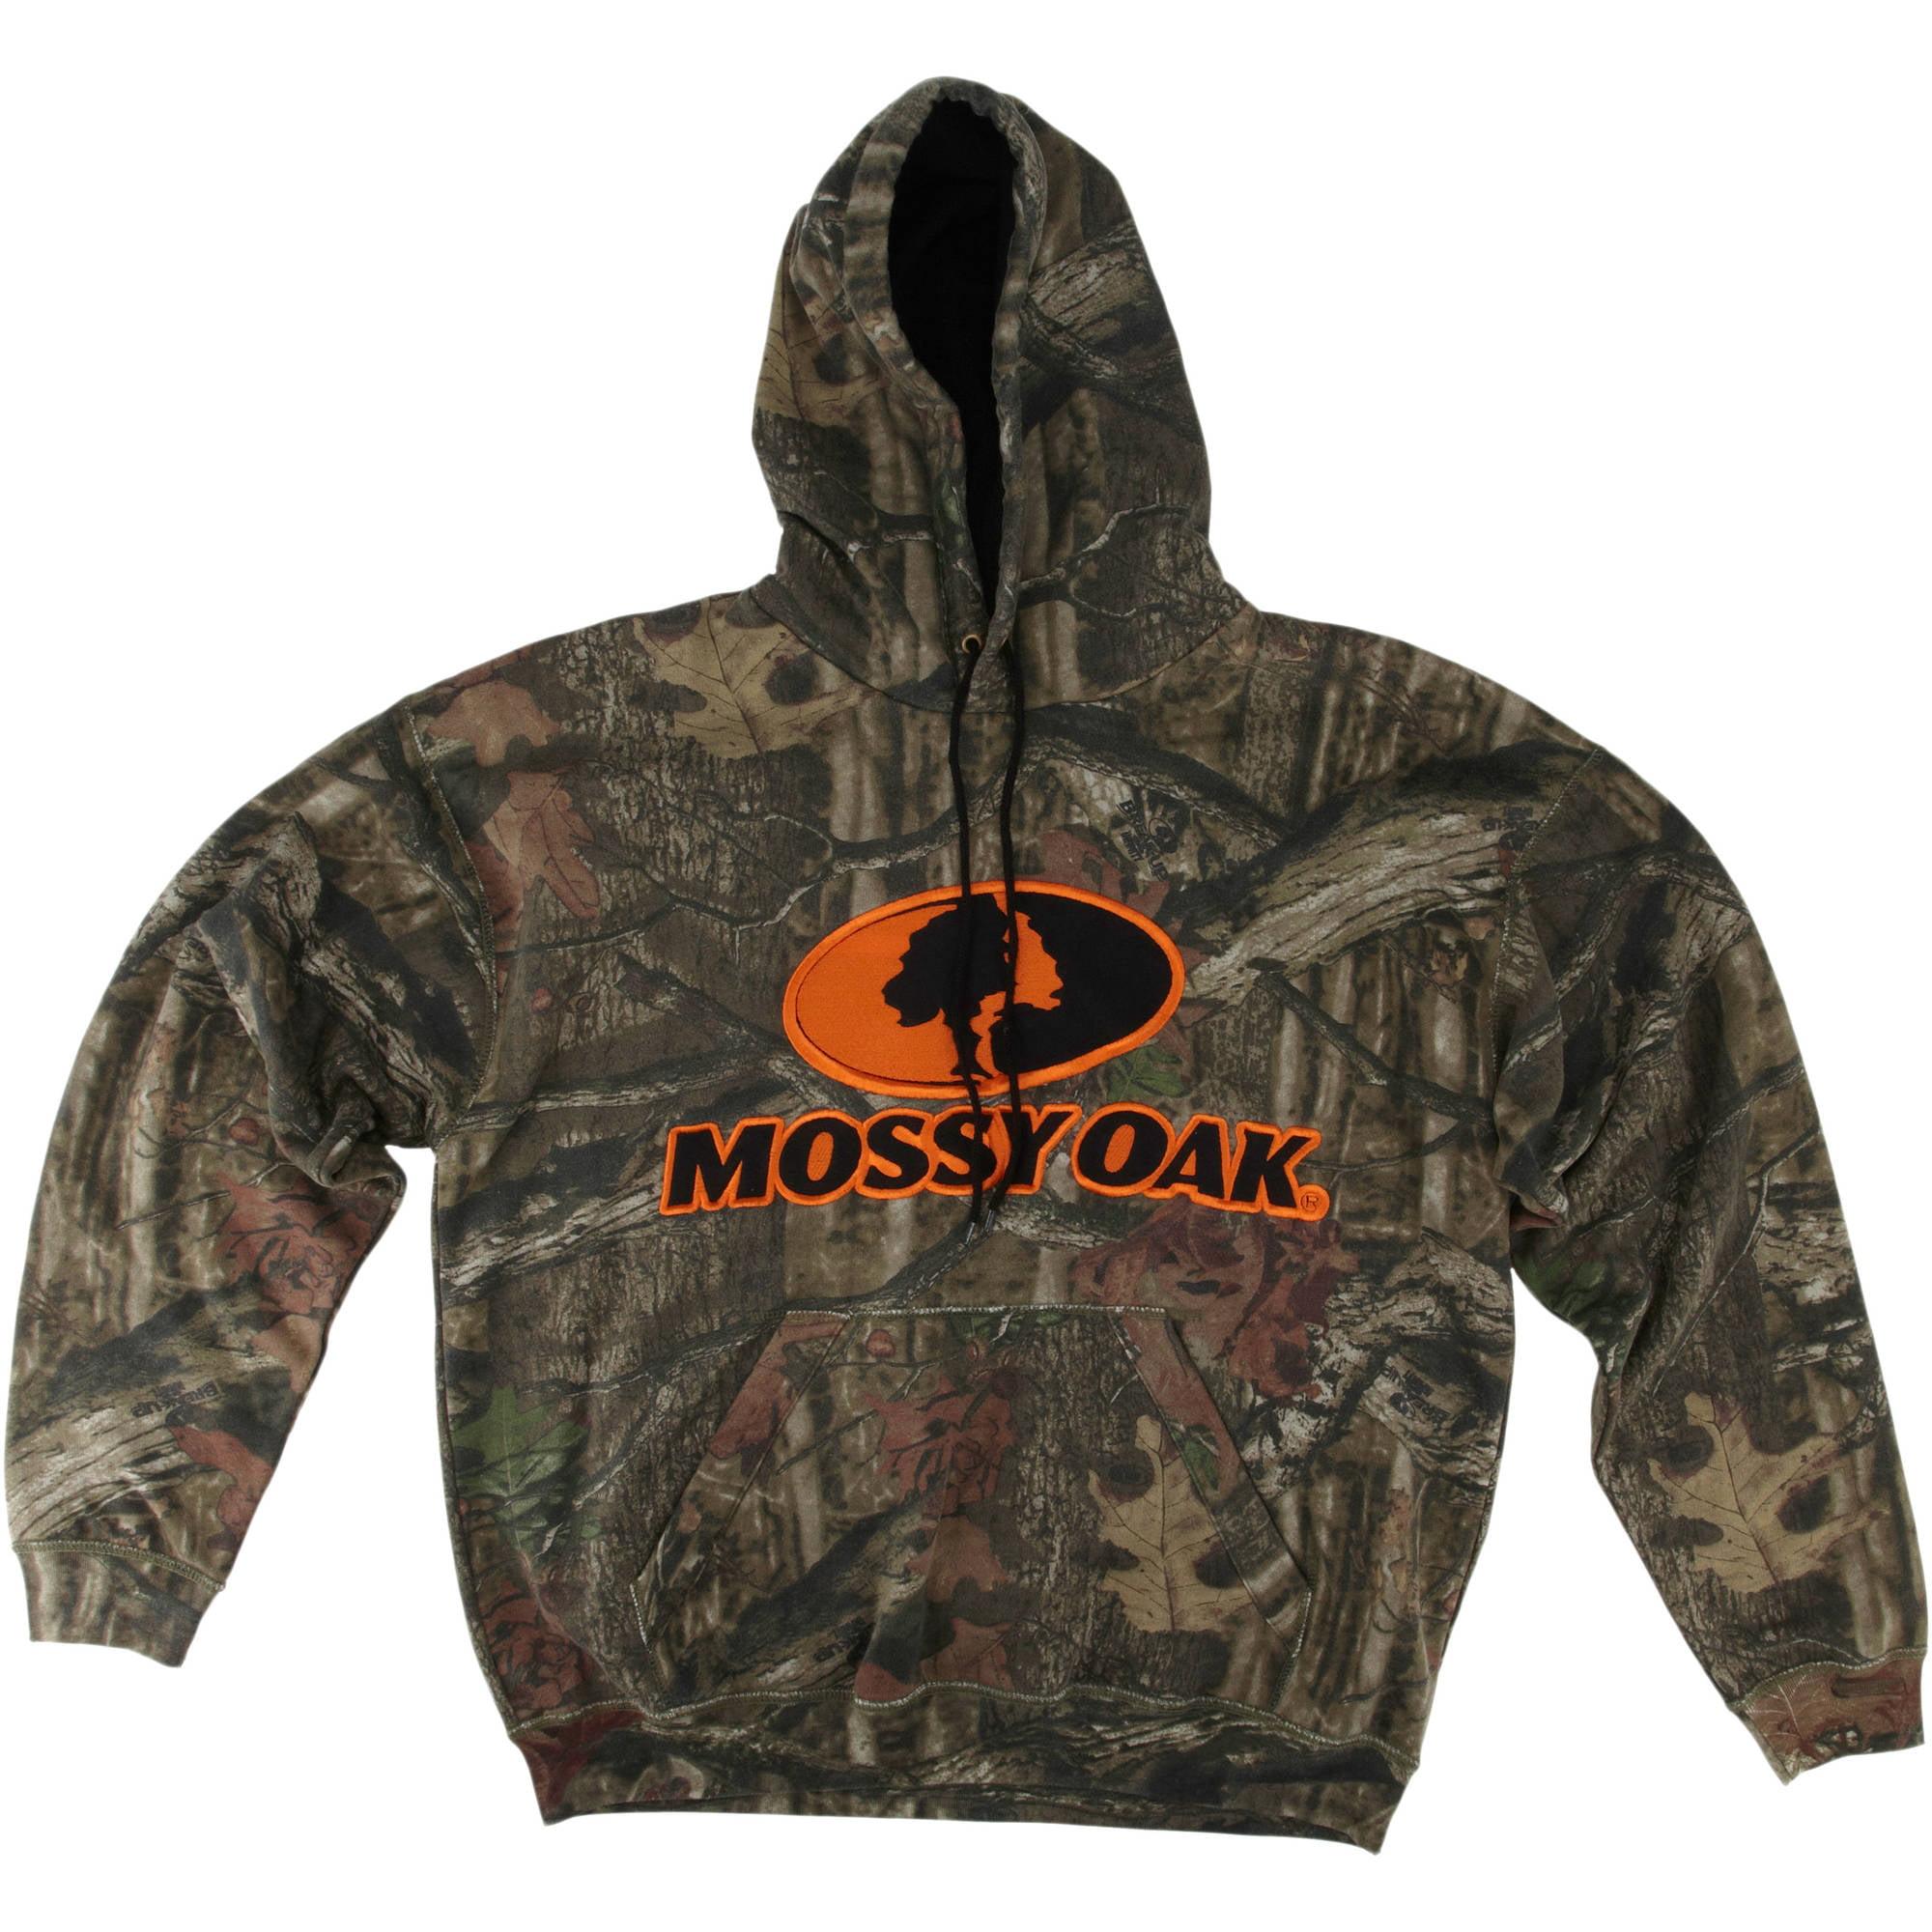 Mossy Oak Infinity Men's Logo Hoodie, Camo